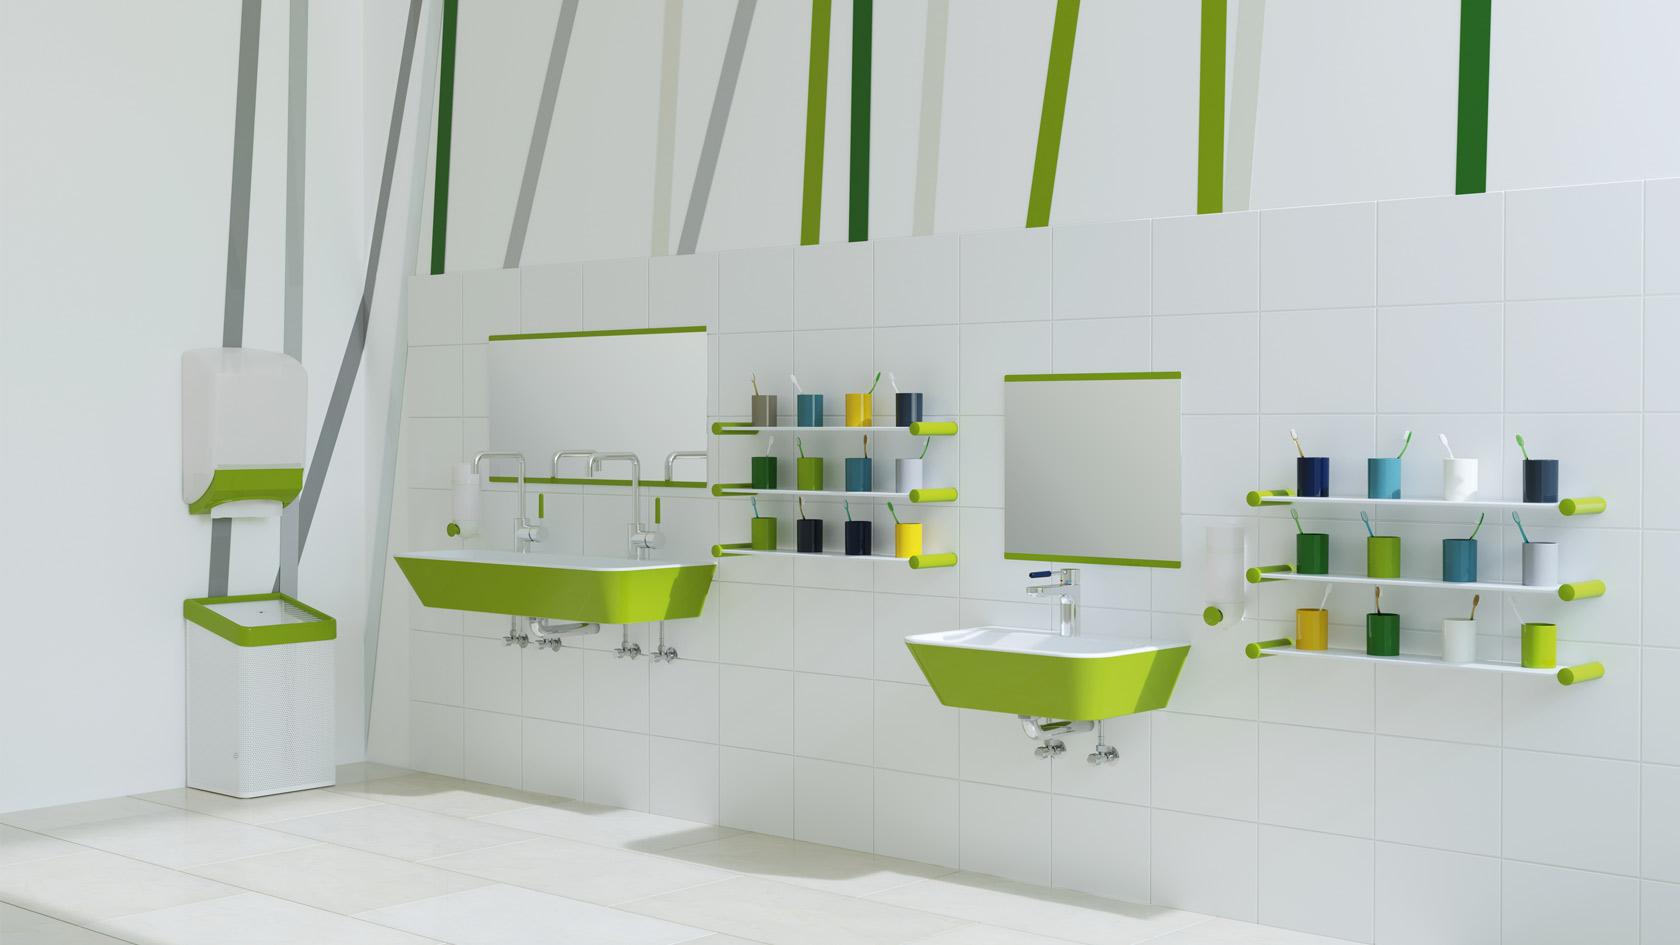 Sanitarprodukte Kindergarten Hewi